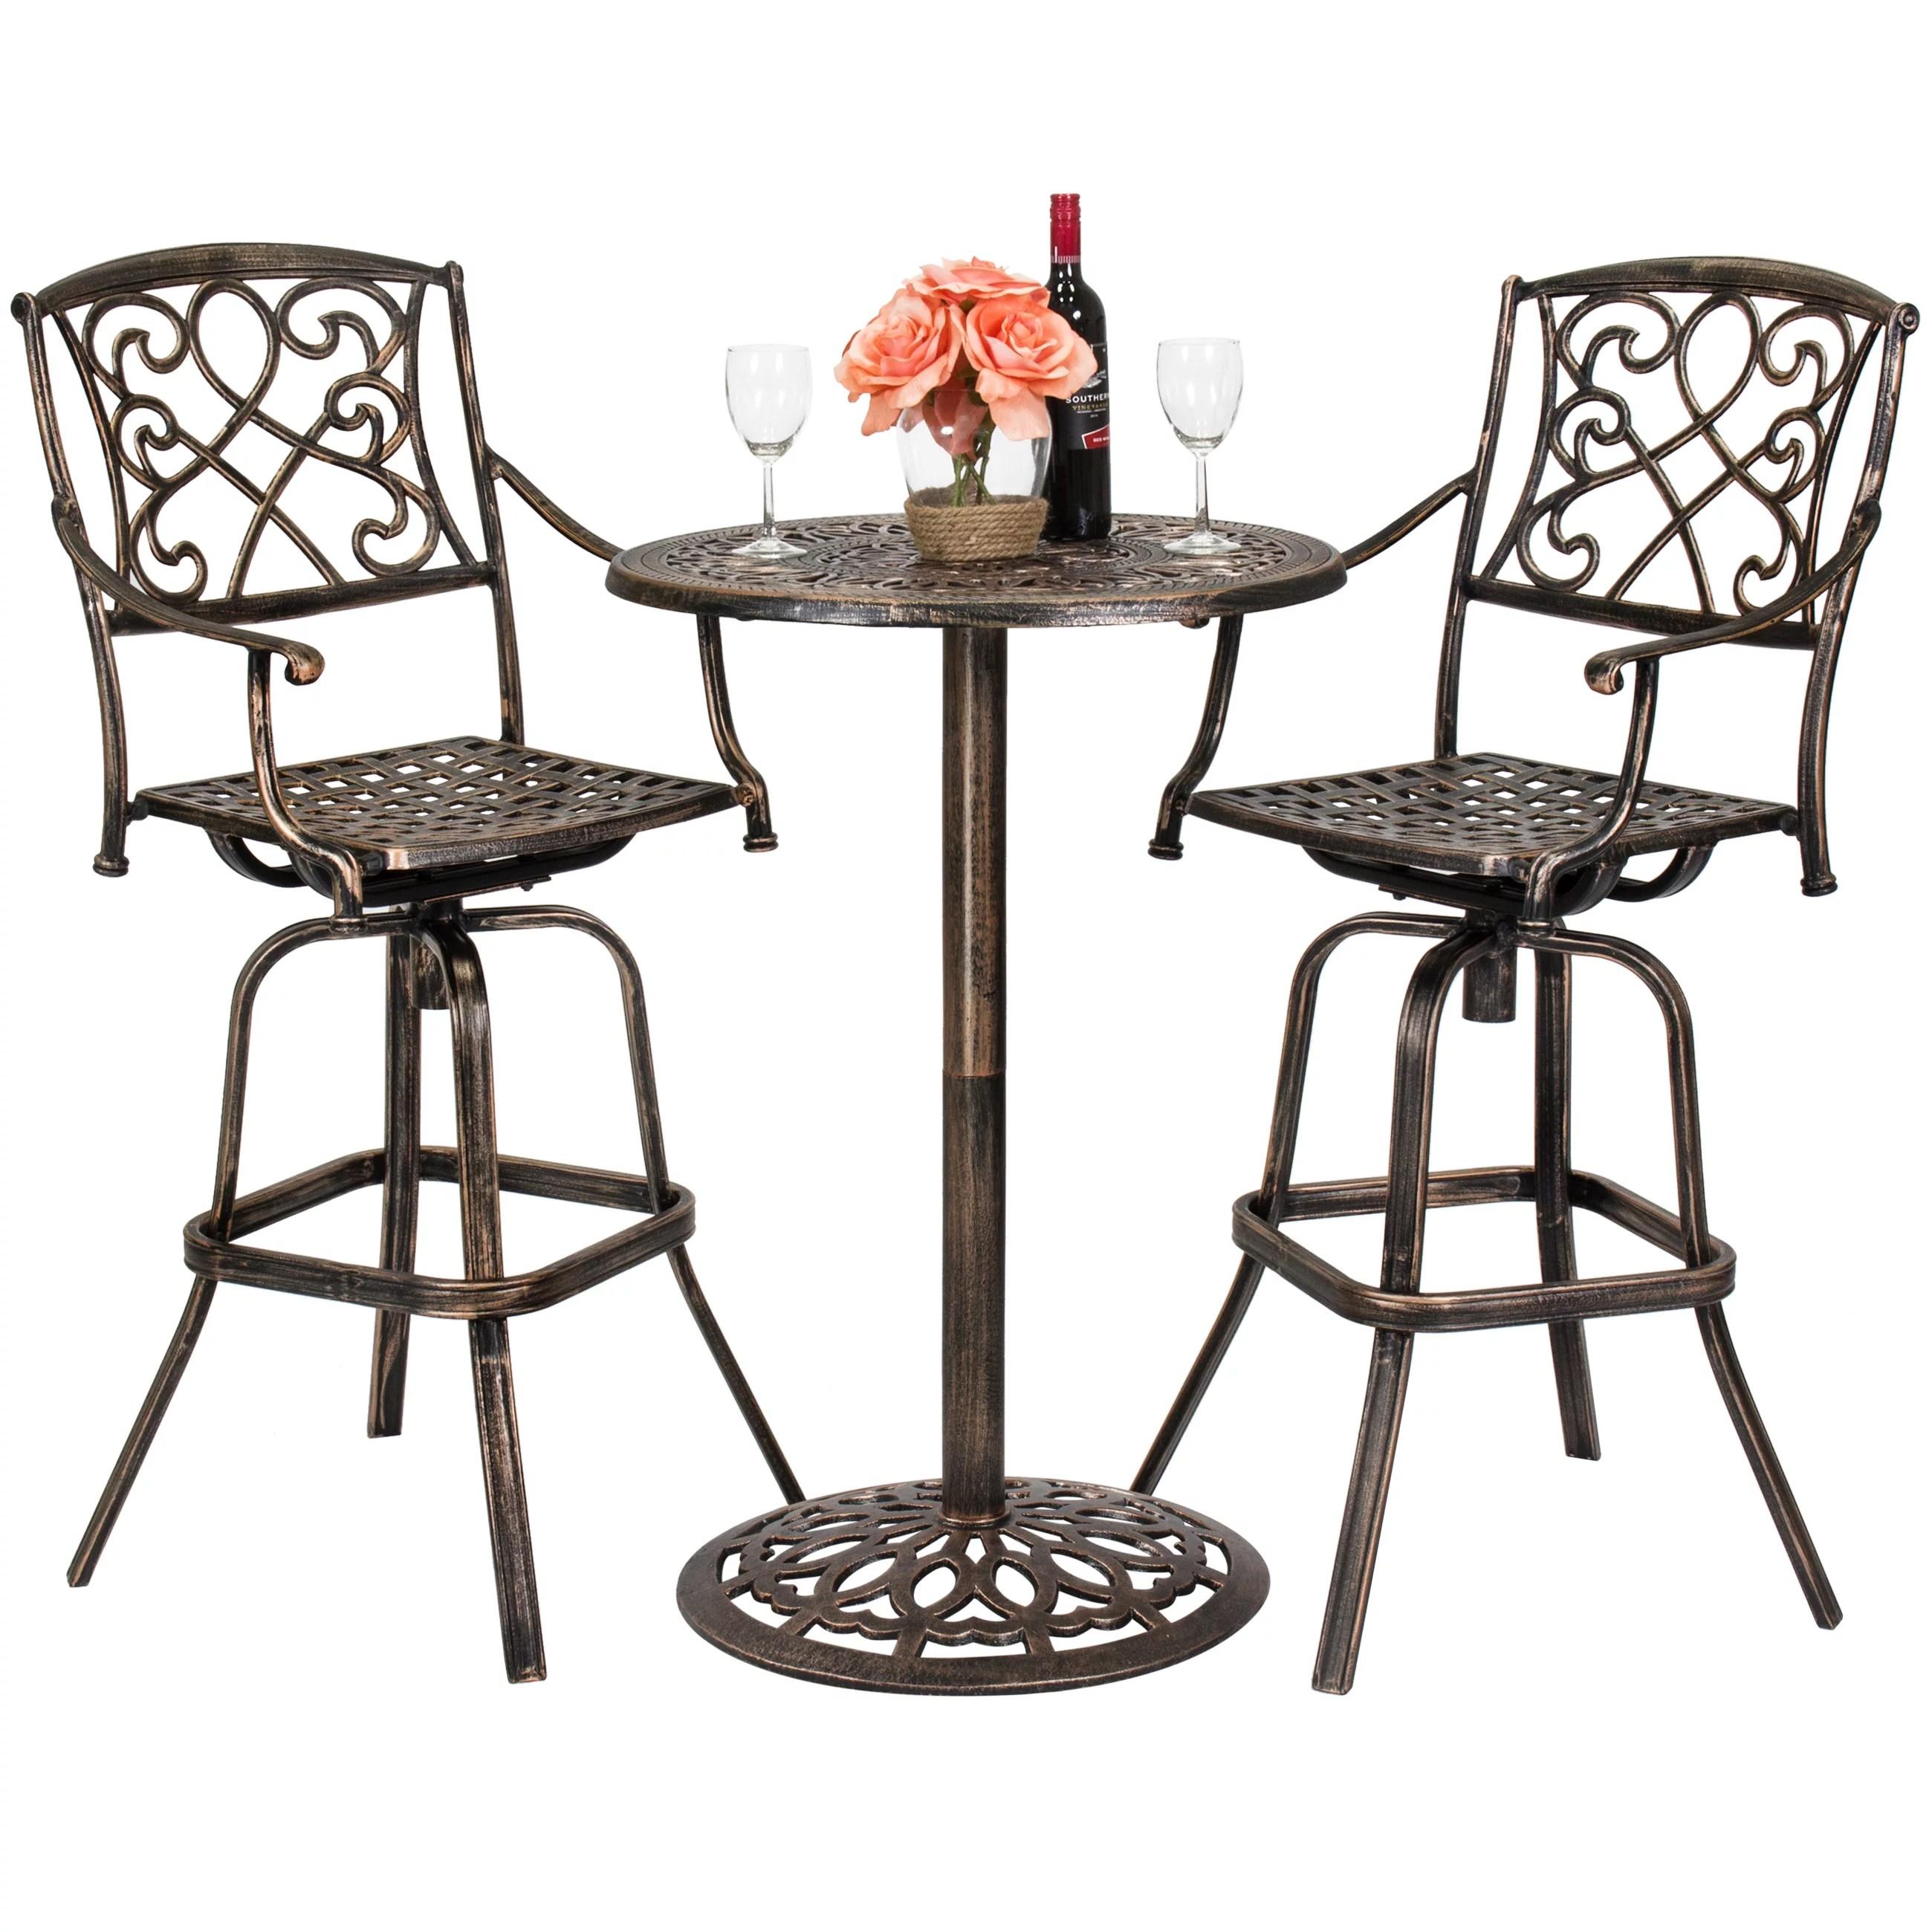 best choice products 3 piece outdoor cast aluminum bar height patio bistro set w 2 360 swivel chairs antique copper walmart com